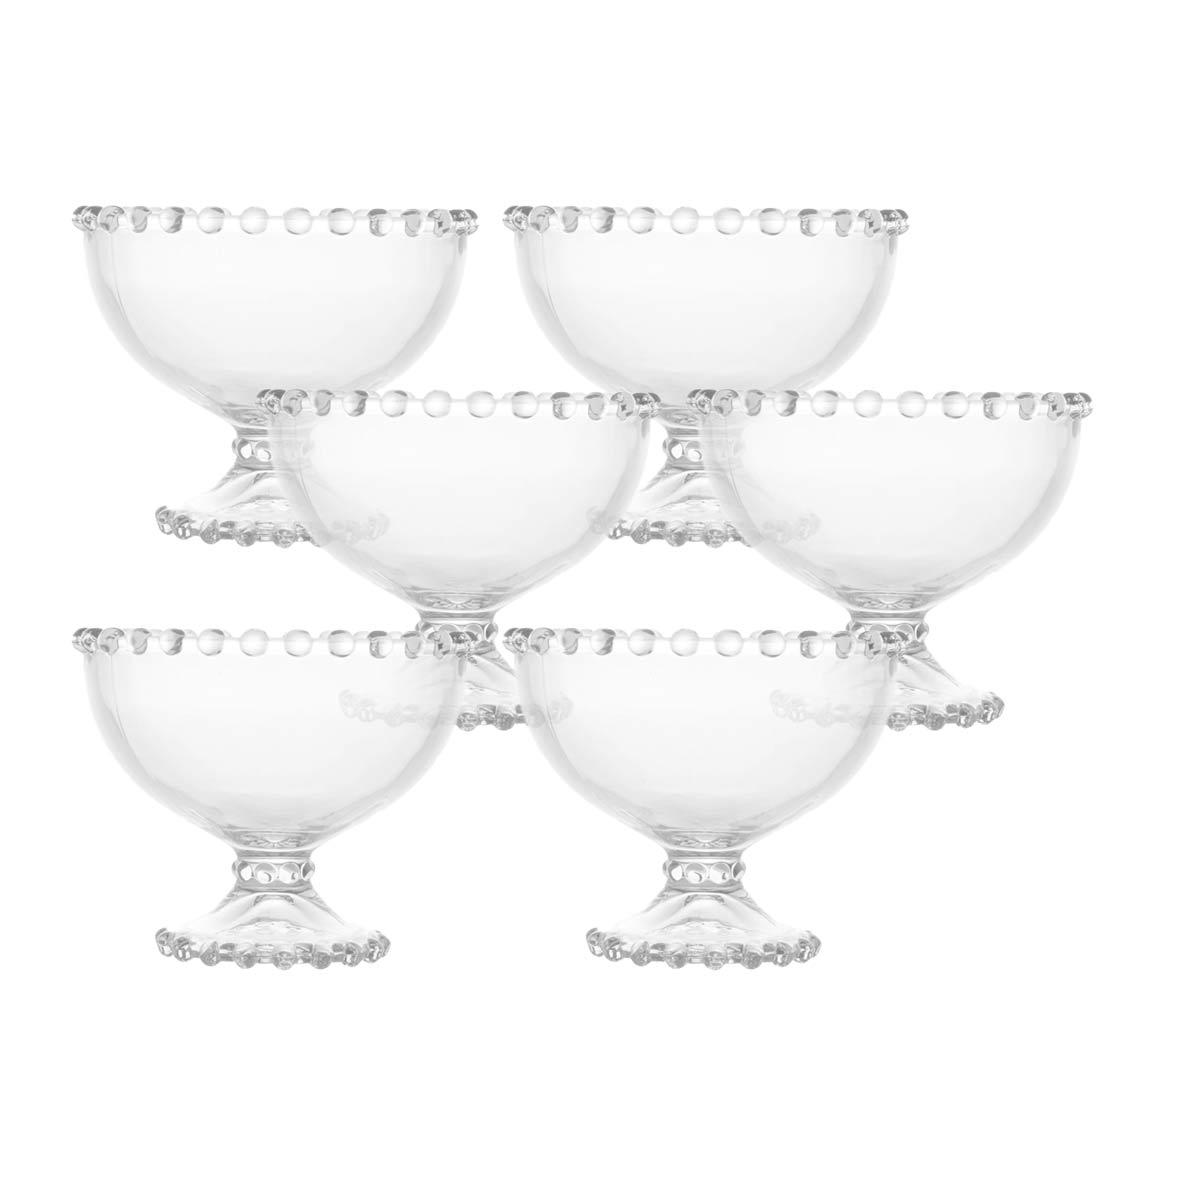 Kit 6 Taças Cristal de Chumbo para Sobremesa Pearl Wolff  - Lemis